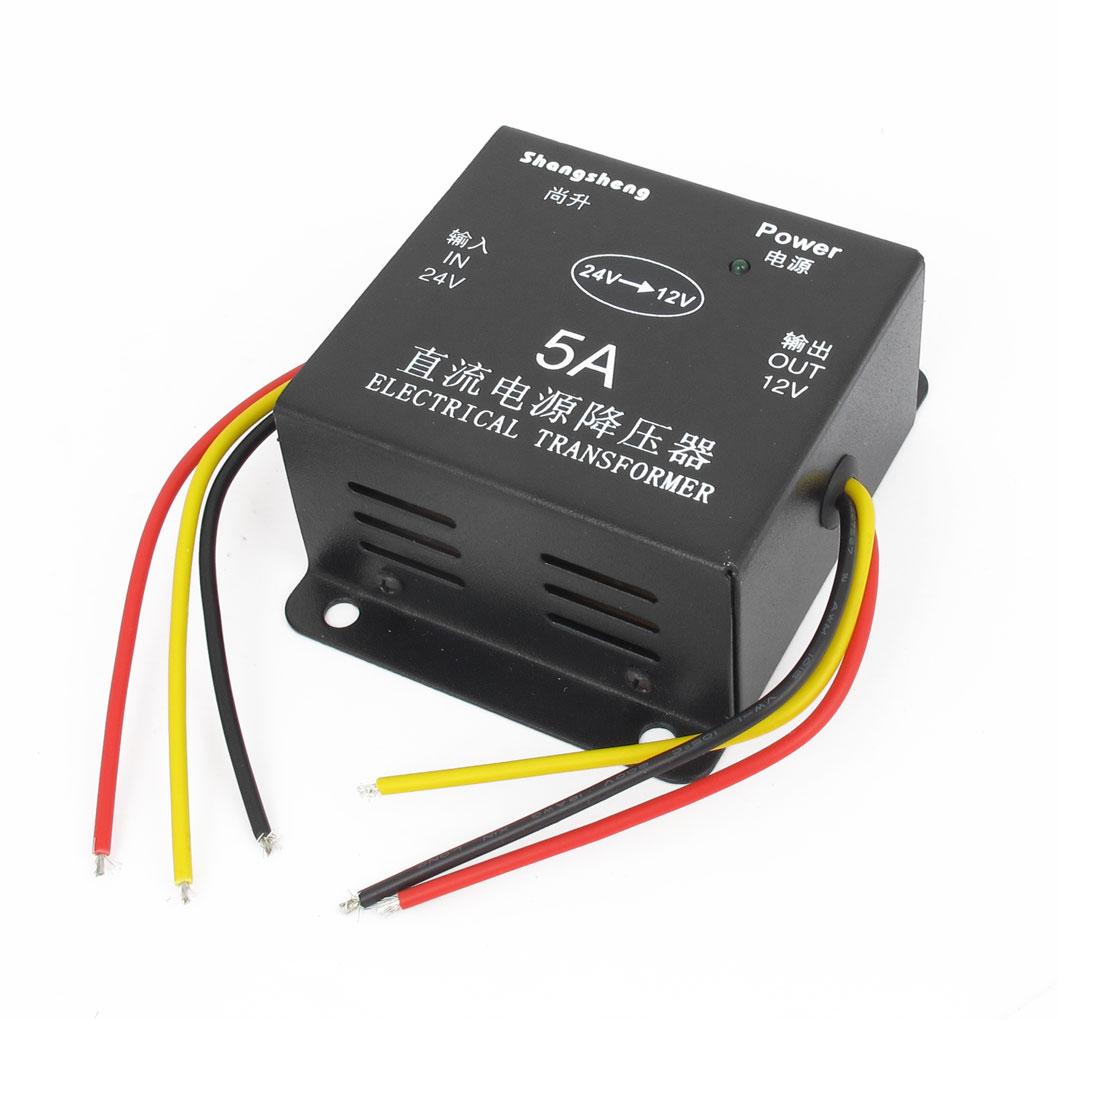 Black Metal Shell DC 24V to 12V Voltage 5A Reducer Converter Transformer for Car